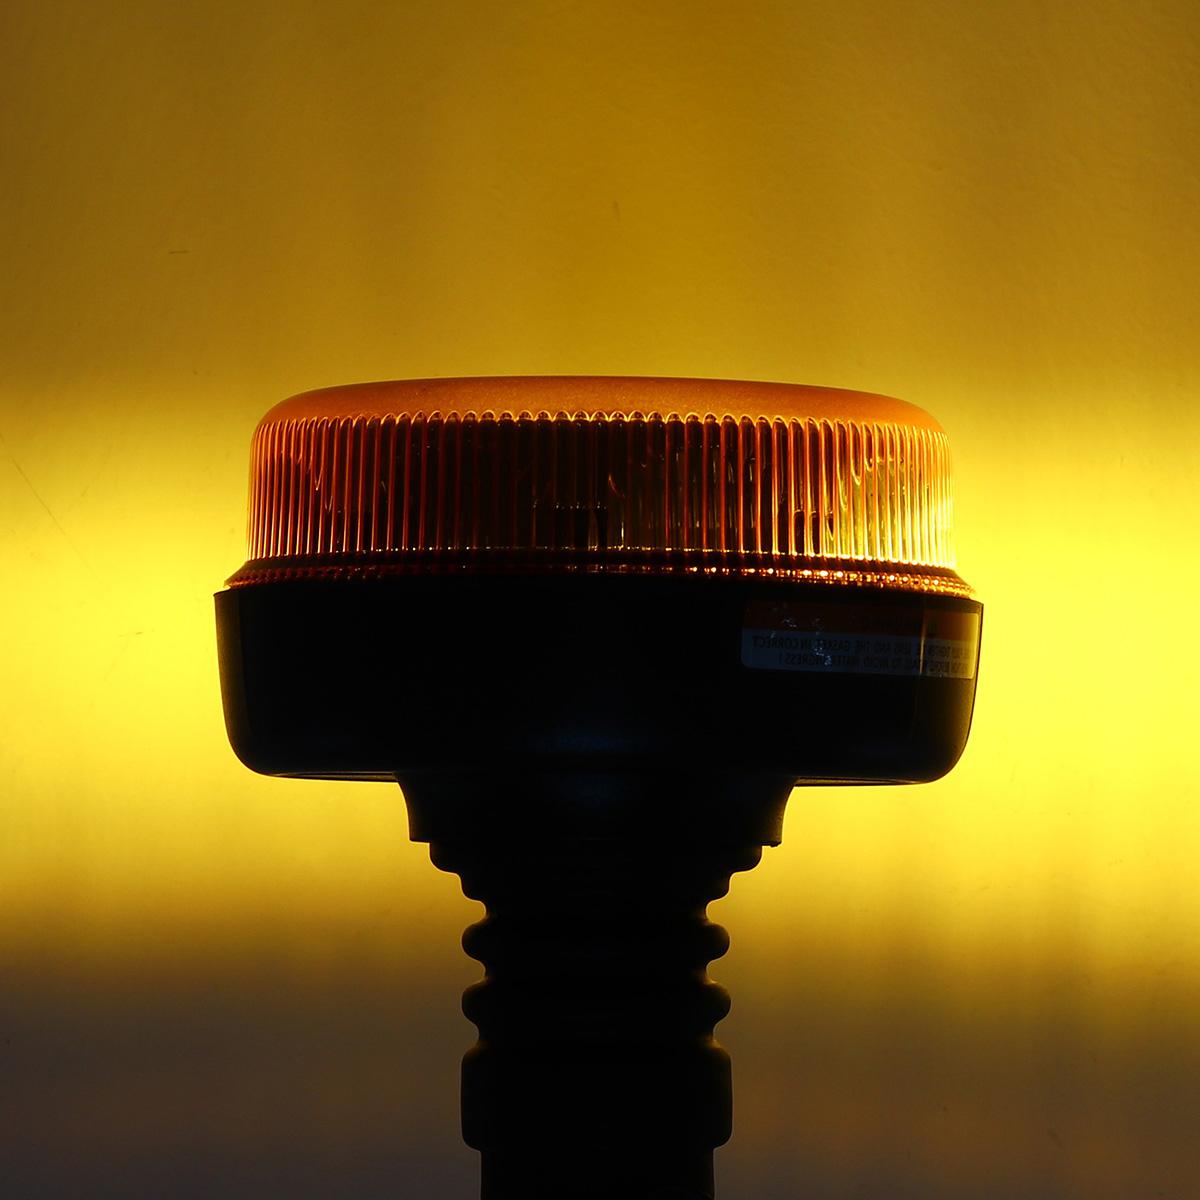 12V 24V E9 LED Rotating Flashing Beacon Flexible DIN Pole Tractor Warning Light